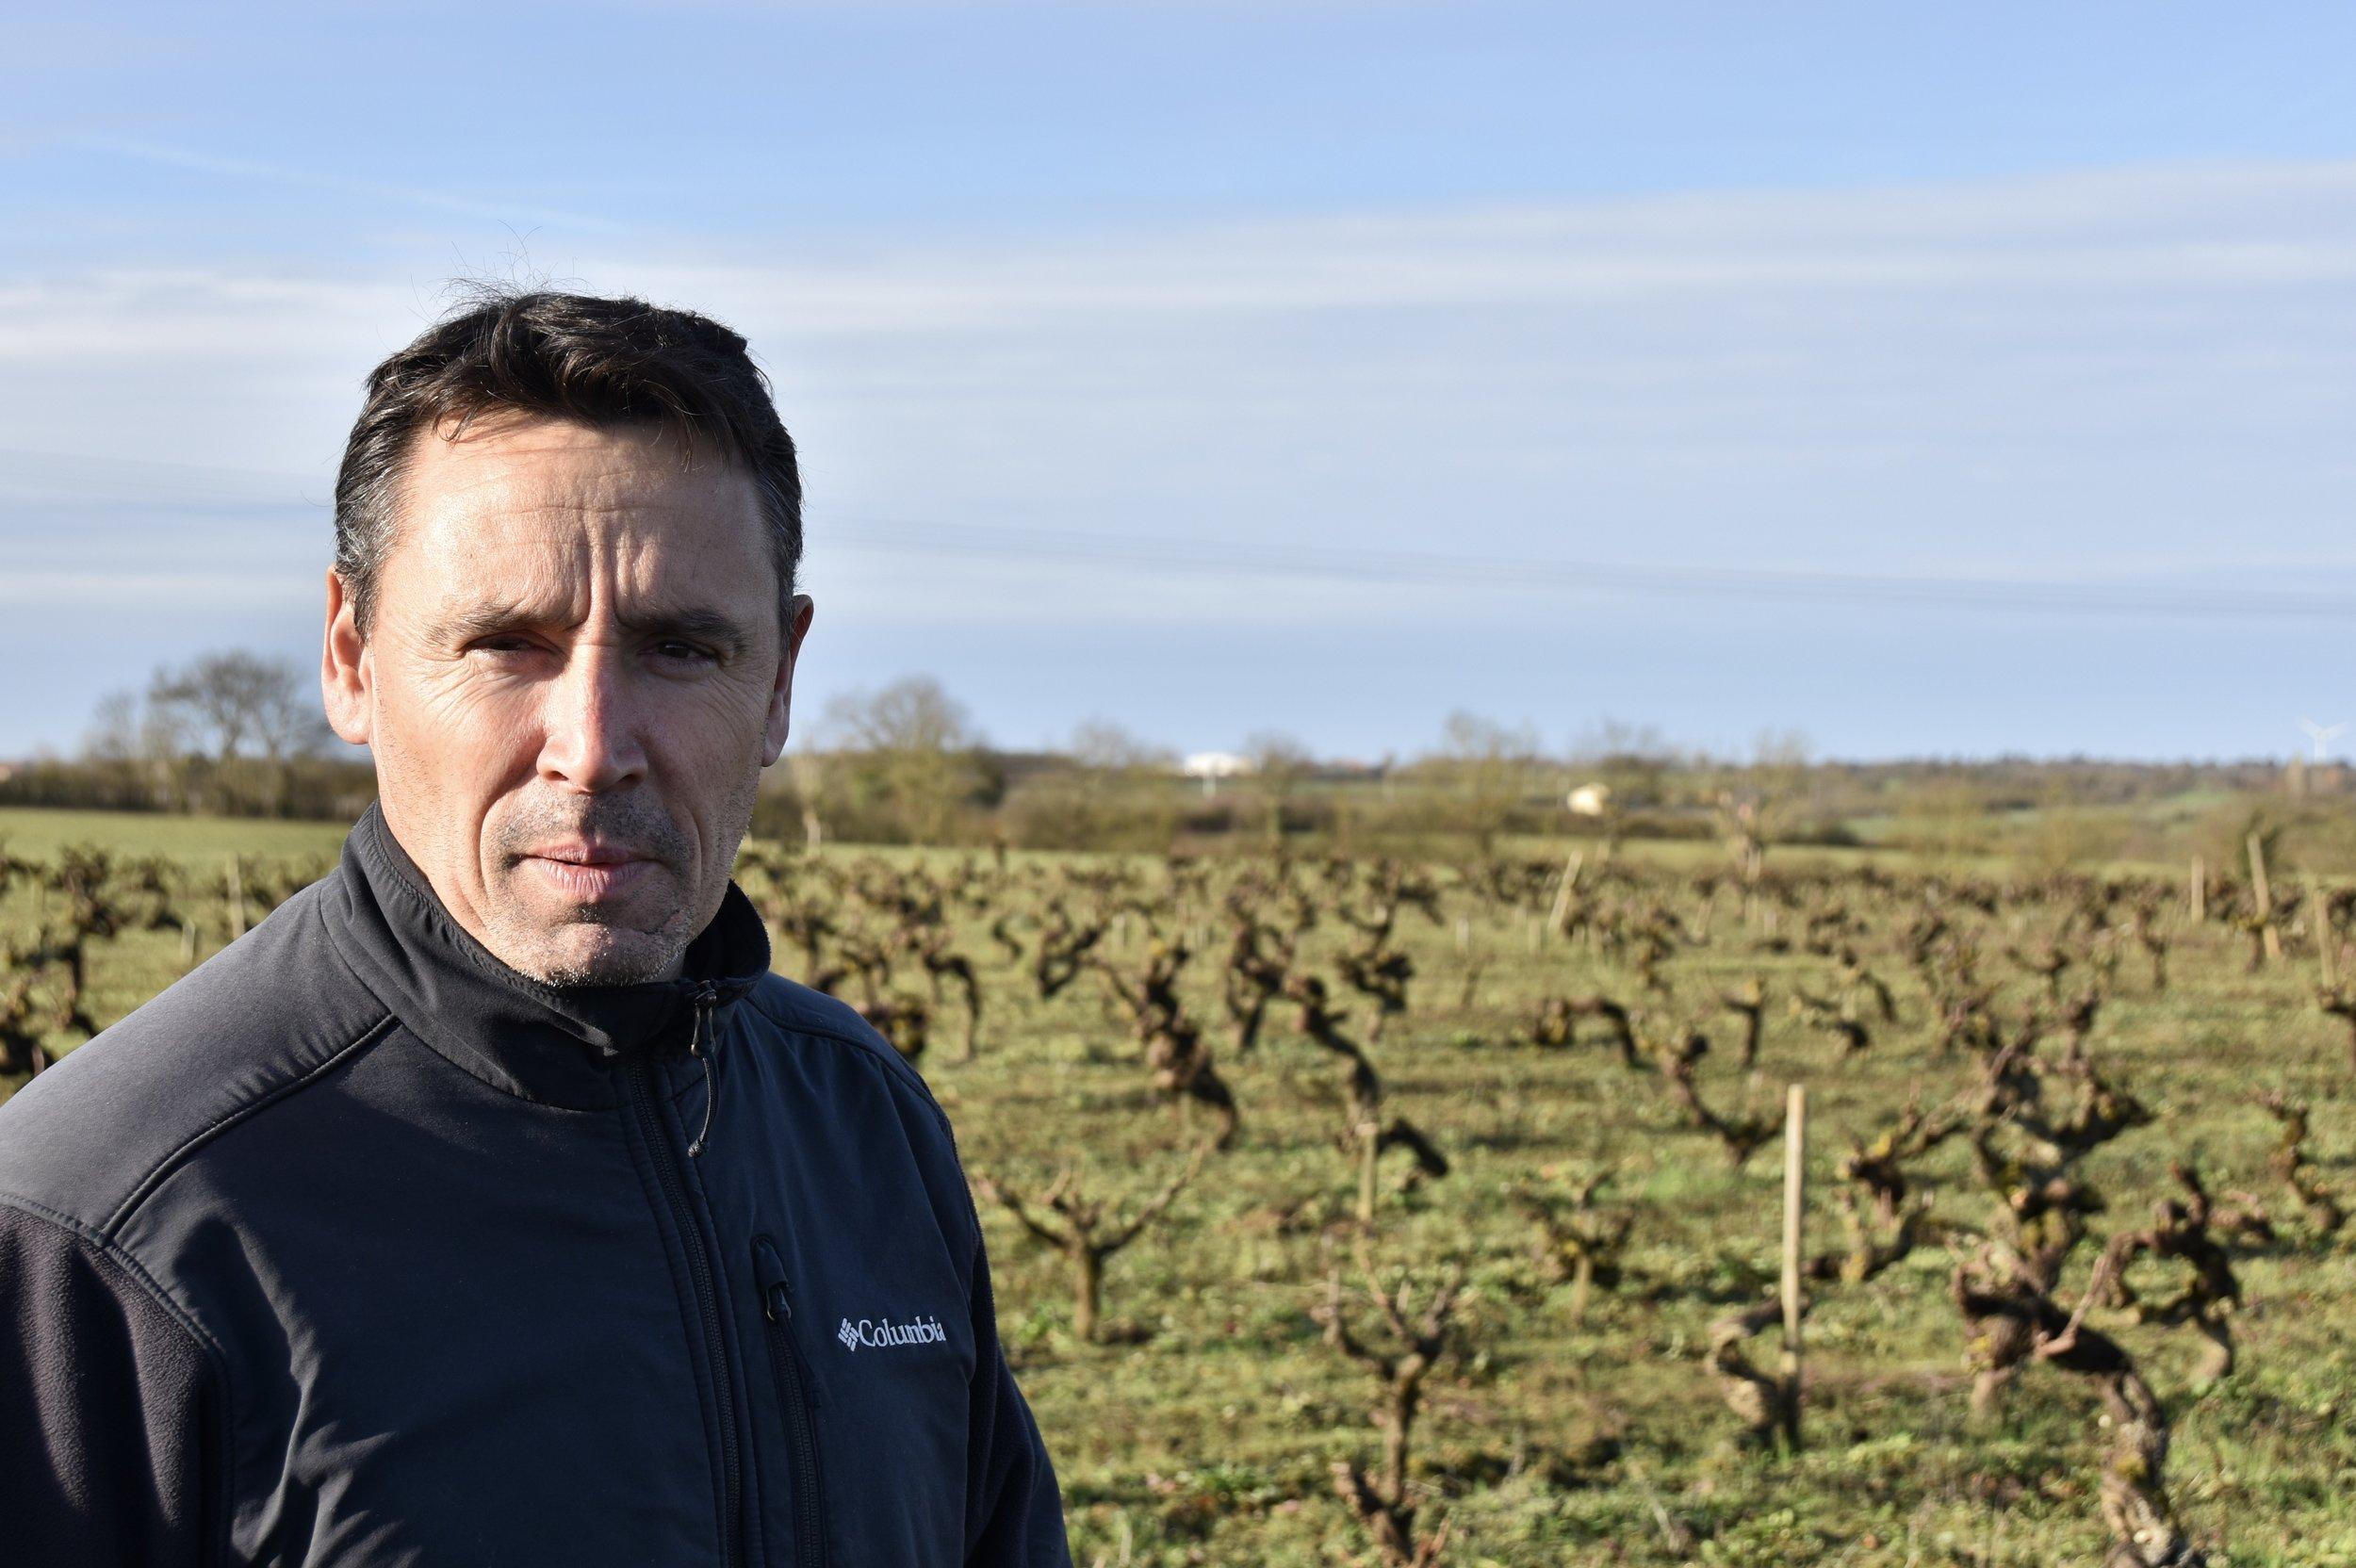 Stéphane Bernaudeau standing in front of Les Nourrissons